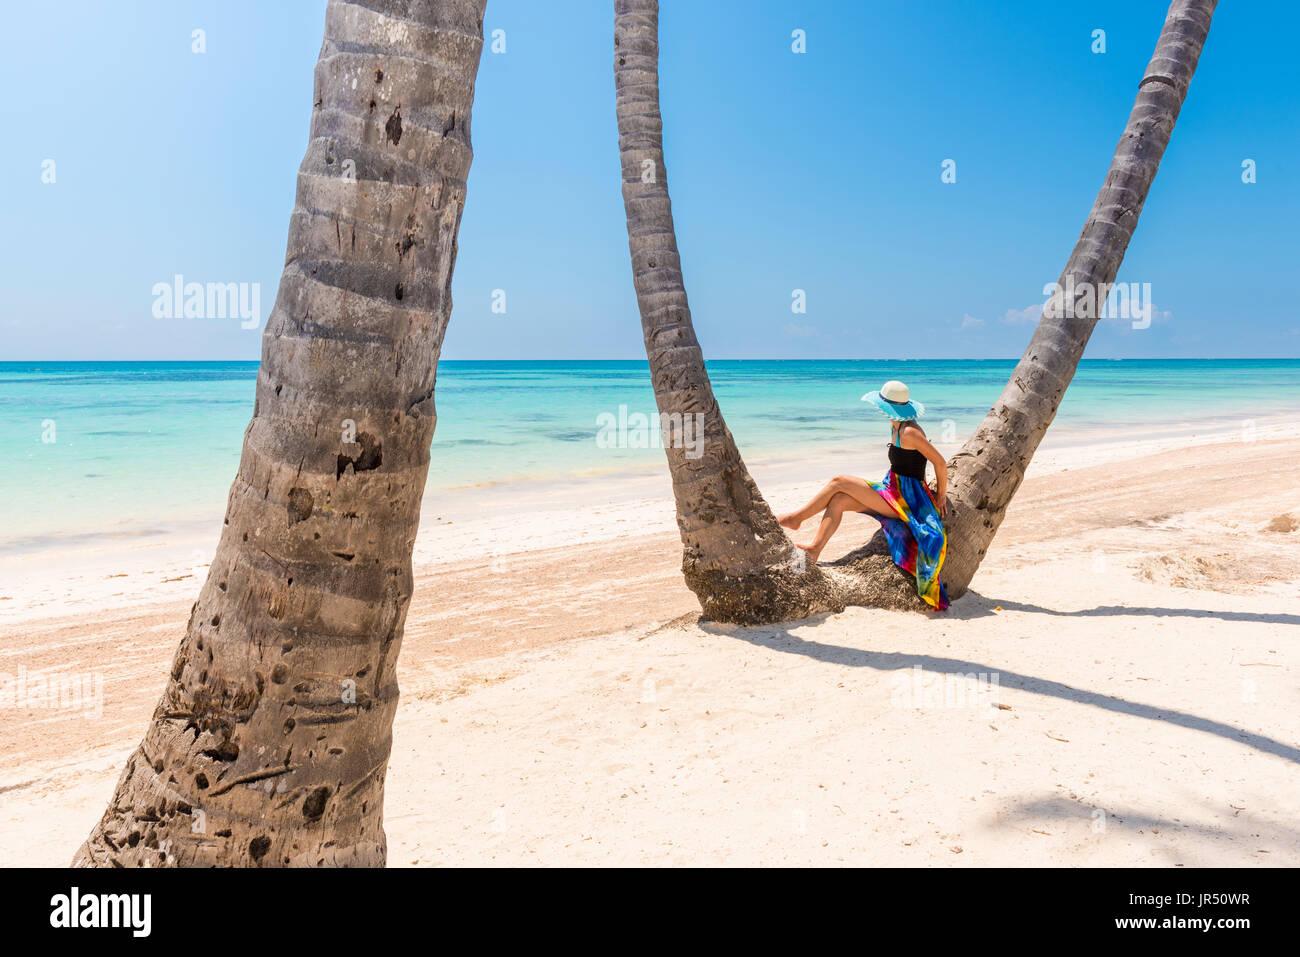 Juanillo Beach (playa Juanillo), Punta Cana, Dominikanische Republik. Frau unter hohen Palmen am Strand. Stockbild